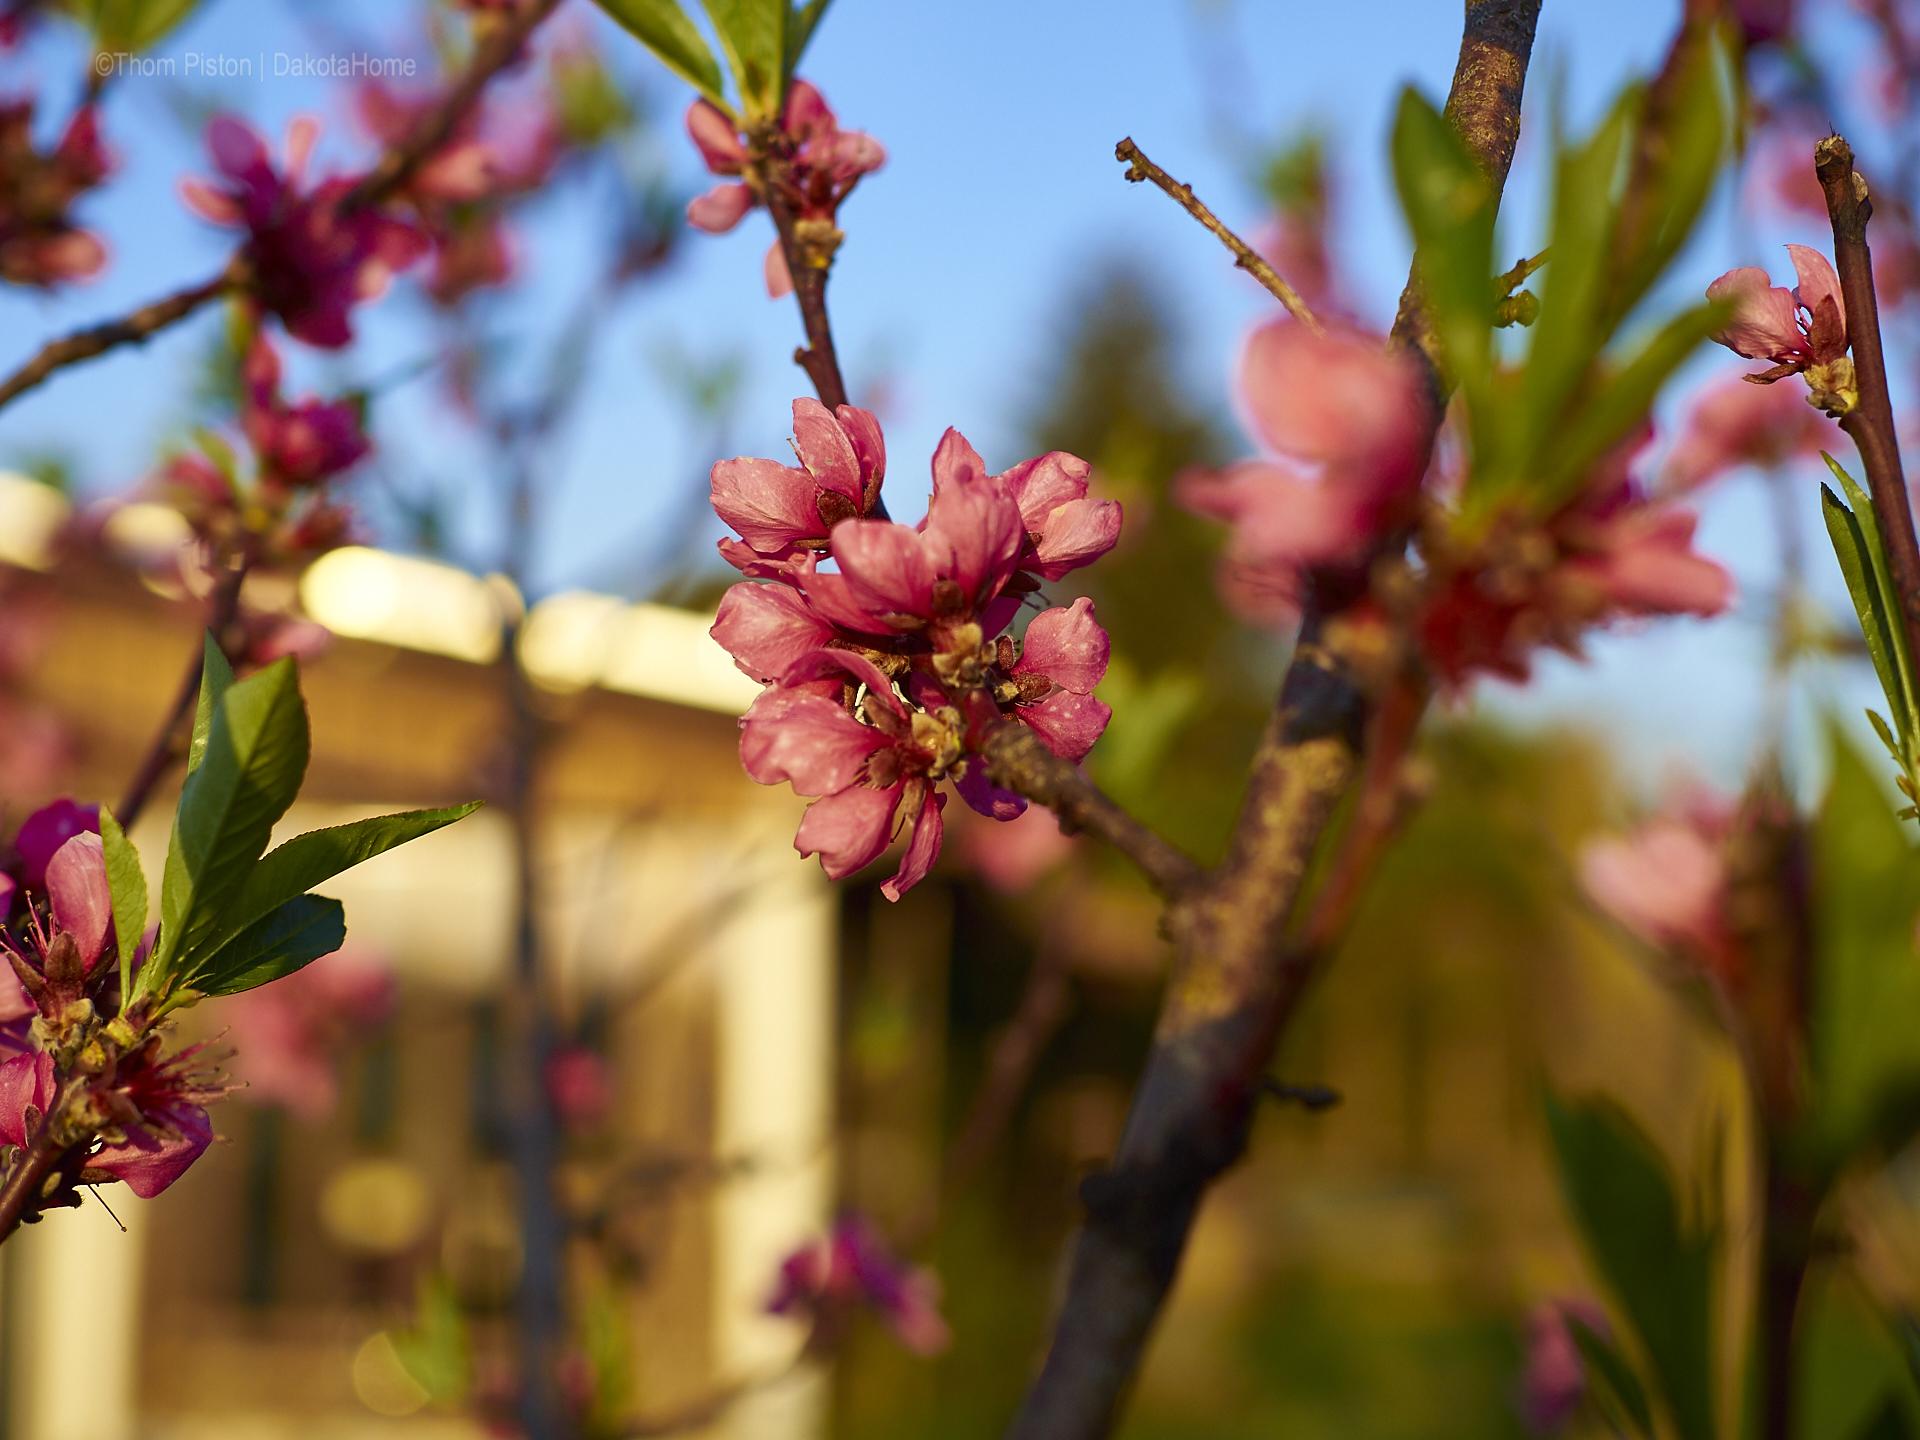 pfirsich blüten at dakota home